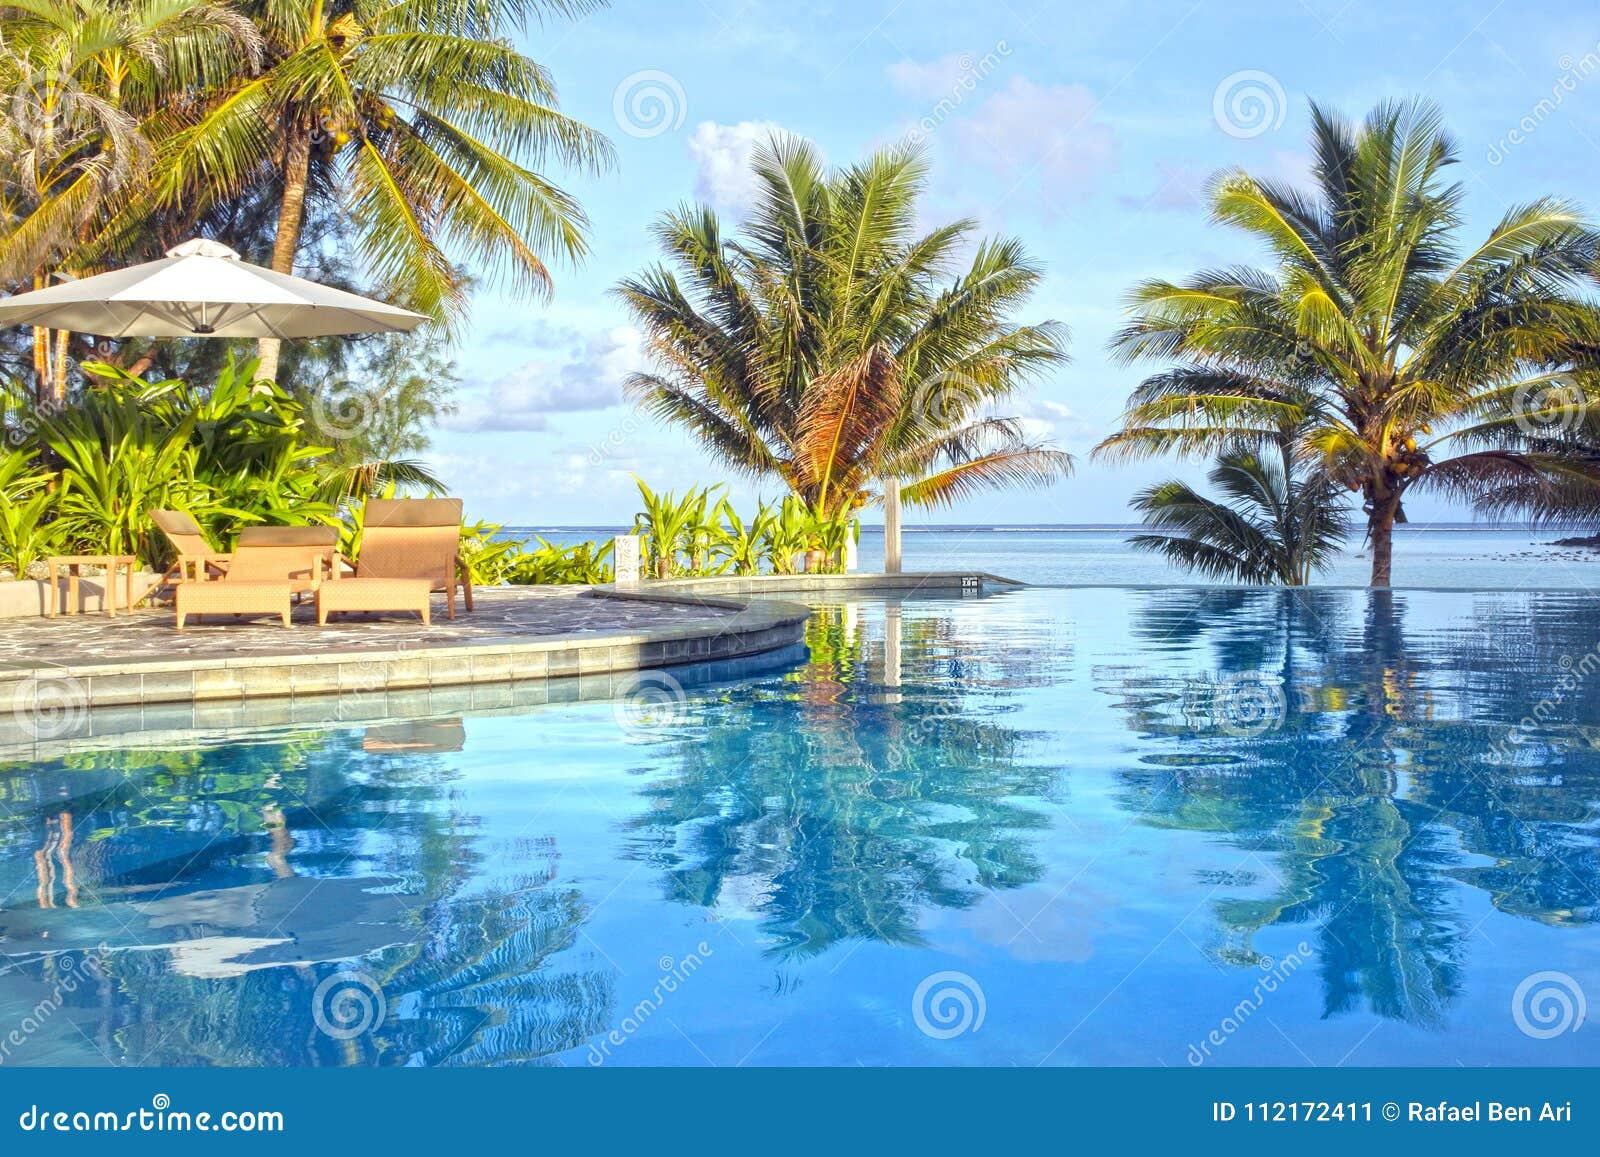 Swimmingpool im tropischen Erholungsort bei Sonnenuntergang